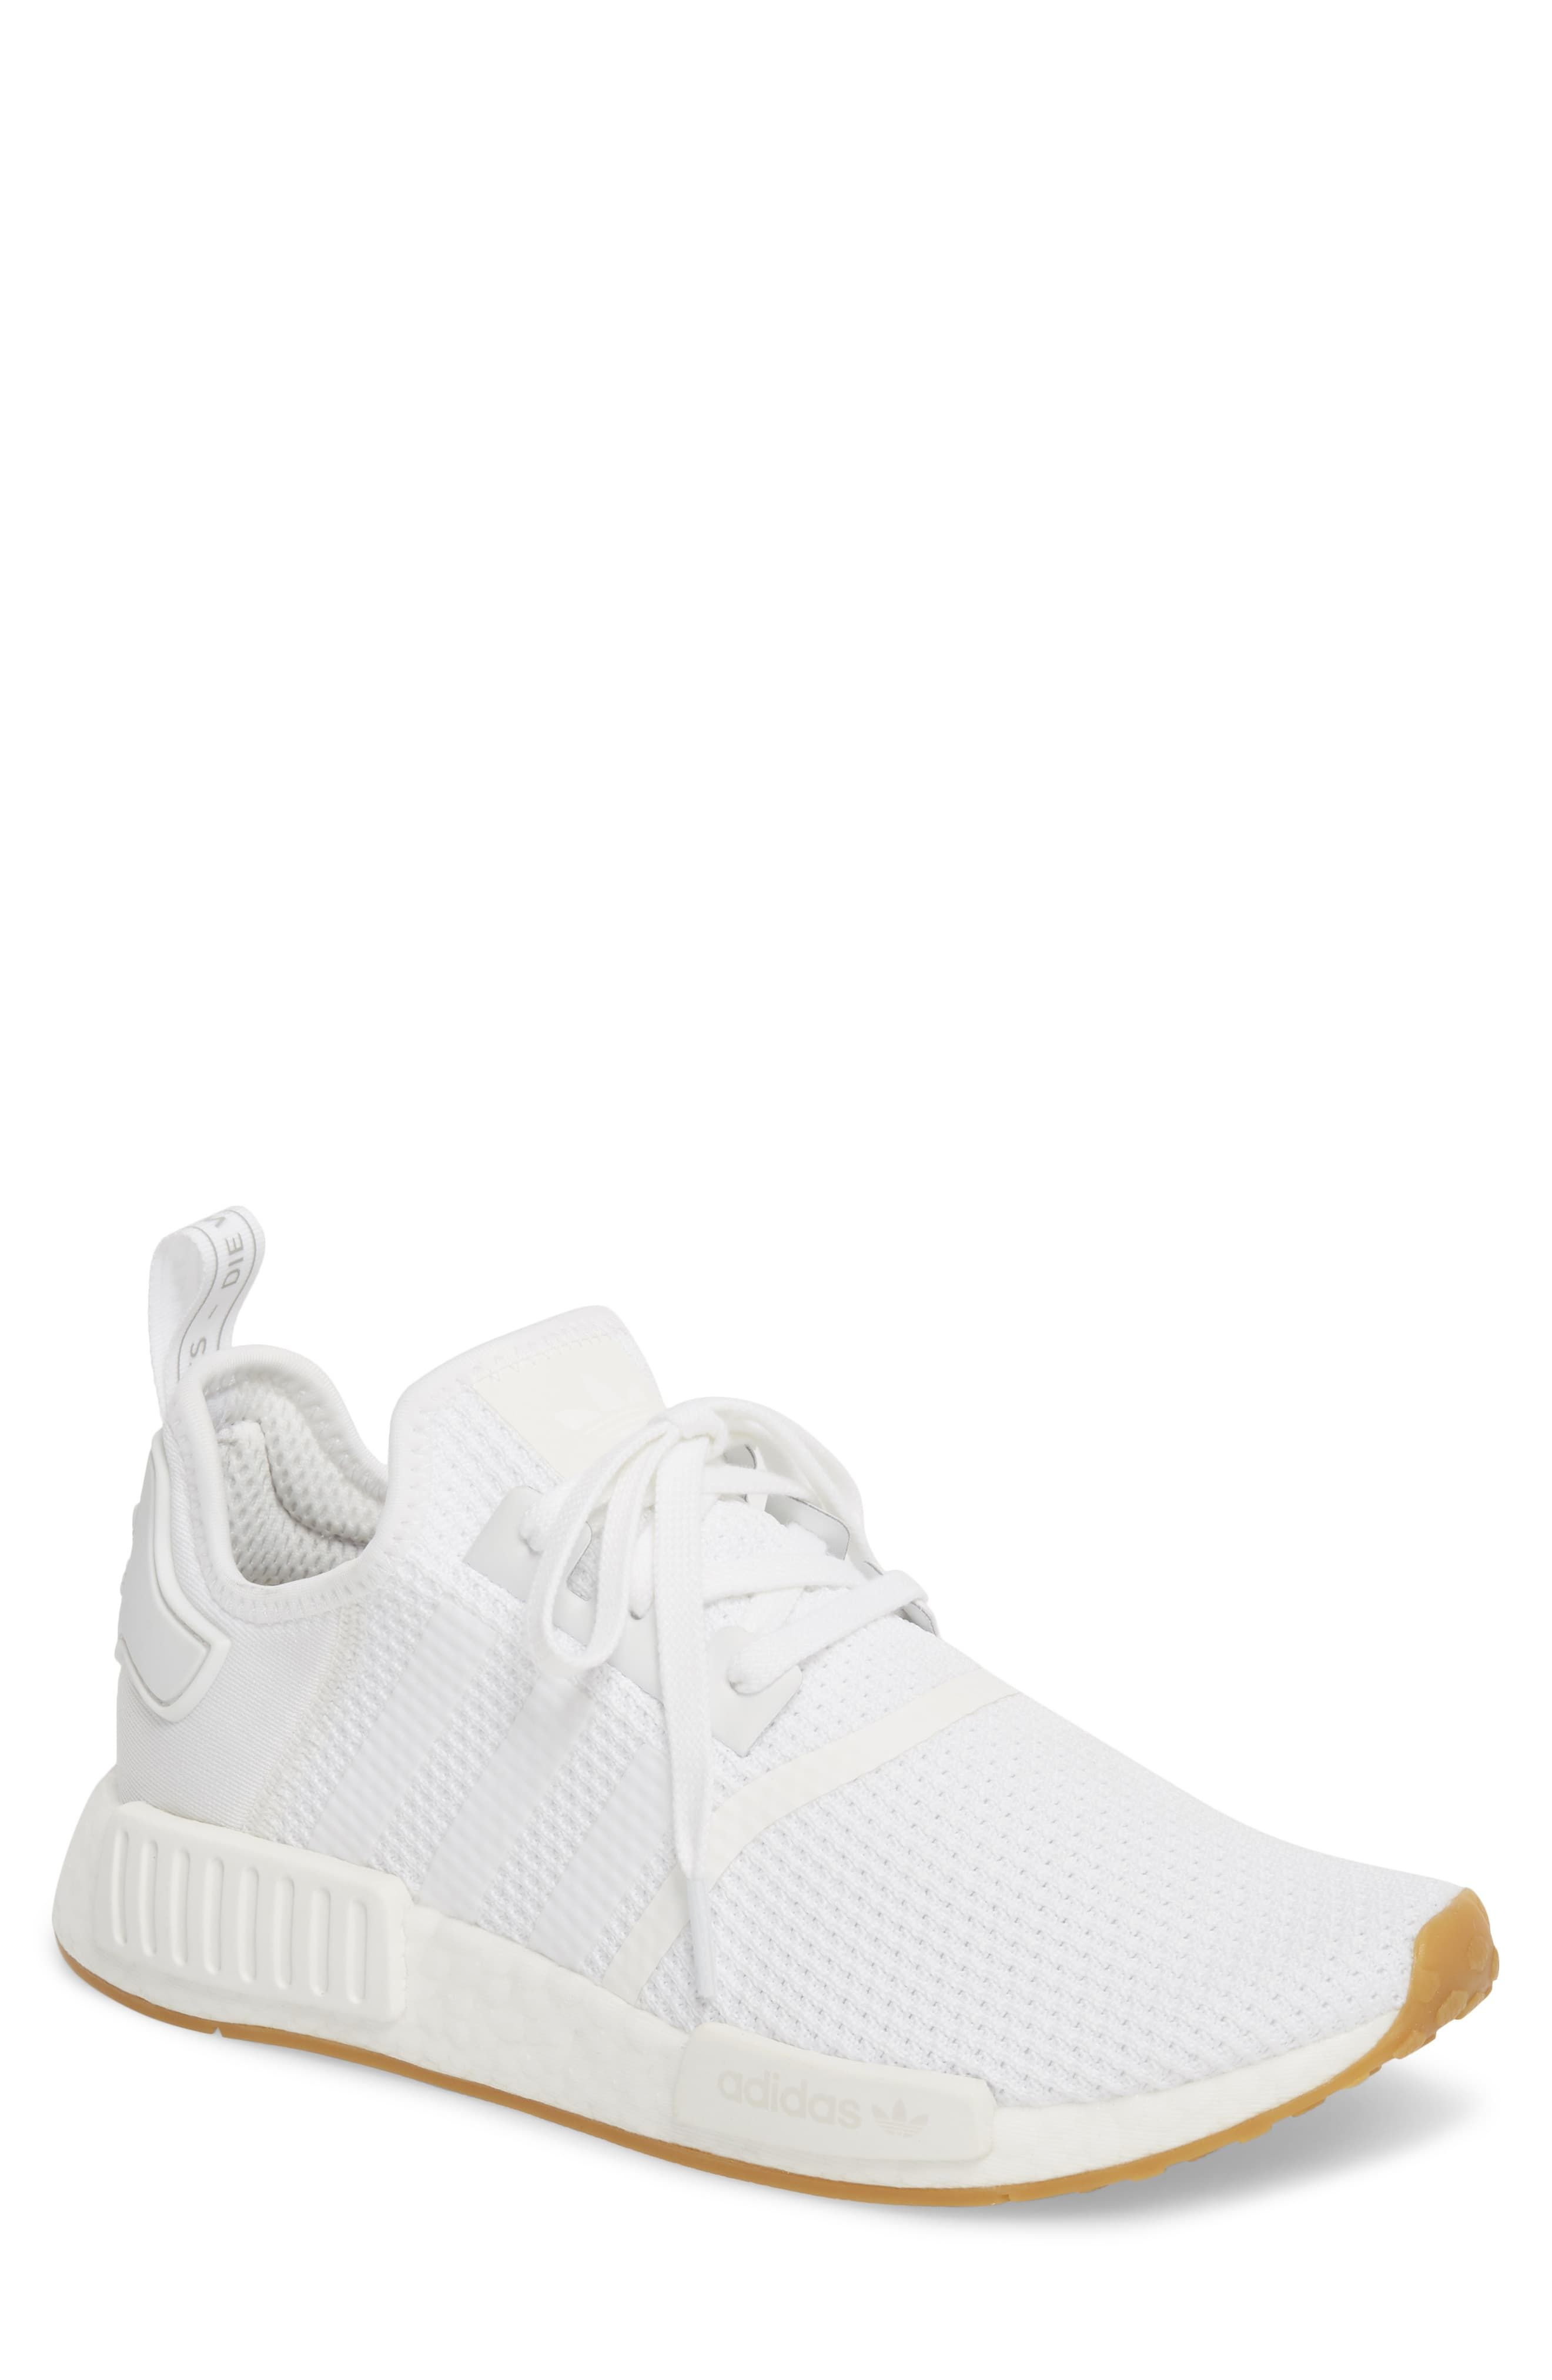 Pin by Elene Galiana on 鞋履 in 2021 | Adidas white shoes, Adidas ...